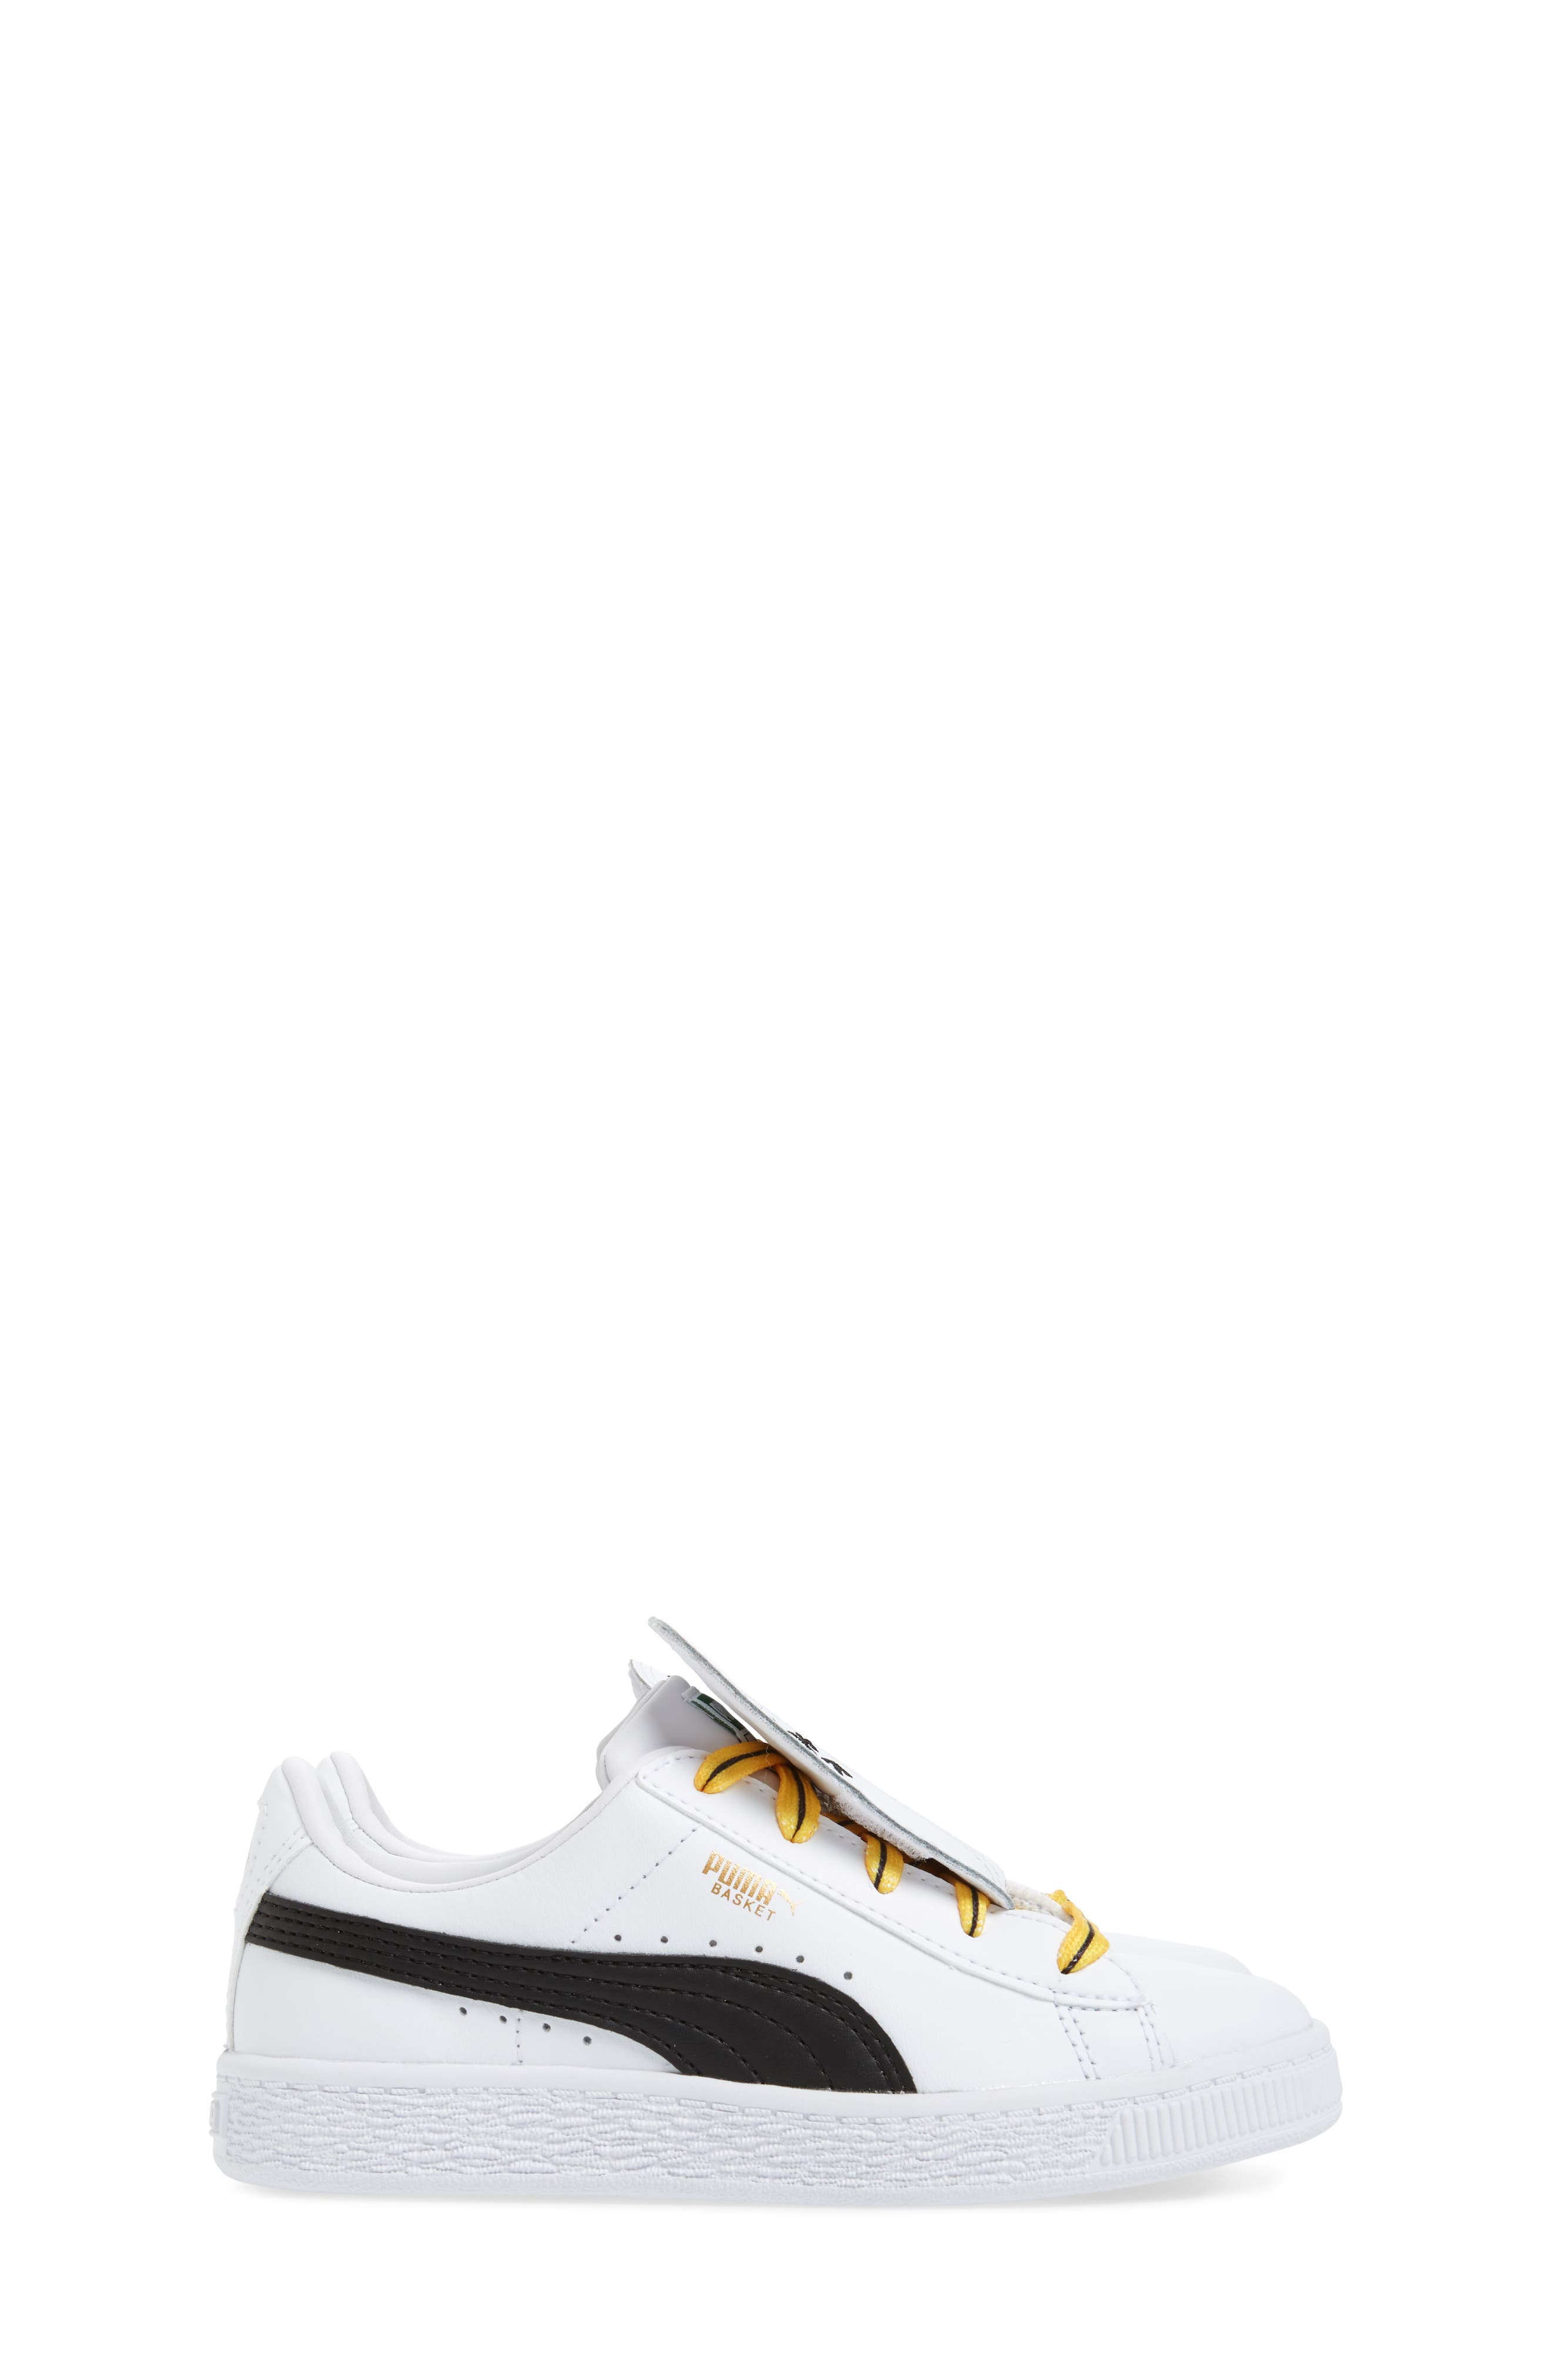 x Minions Basket Embroidered Tongue Sneaker,                             Alternate thumbnail 4, color,                             White/ Black/ Minion Yellow